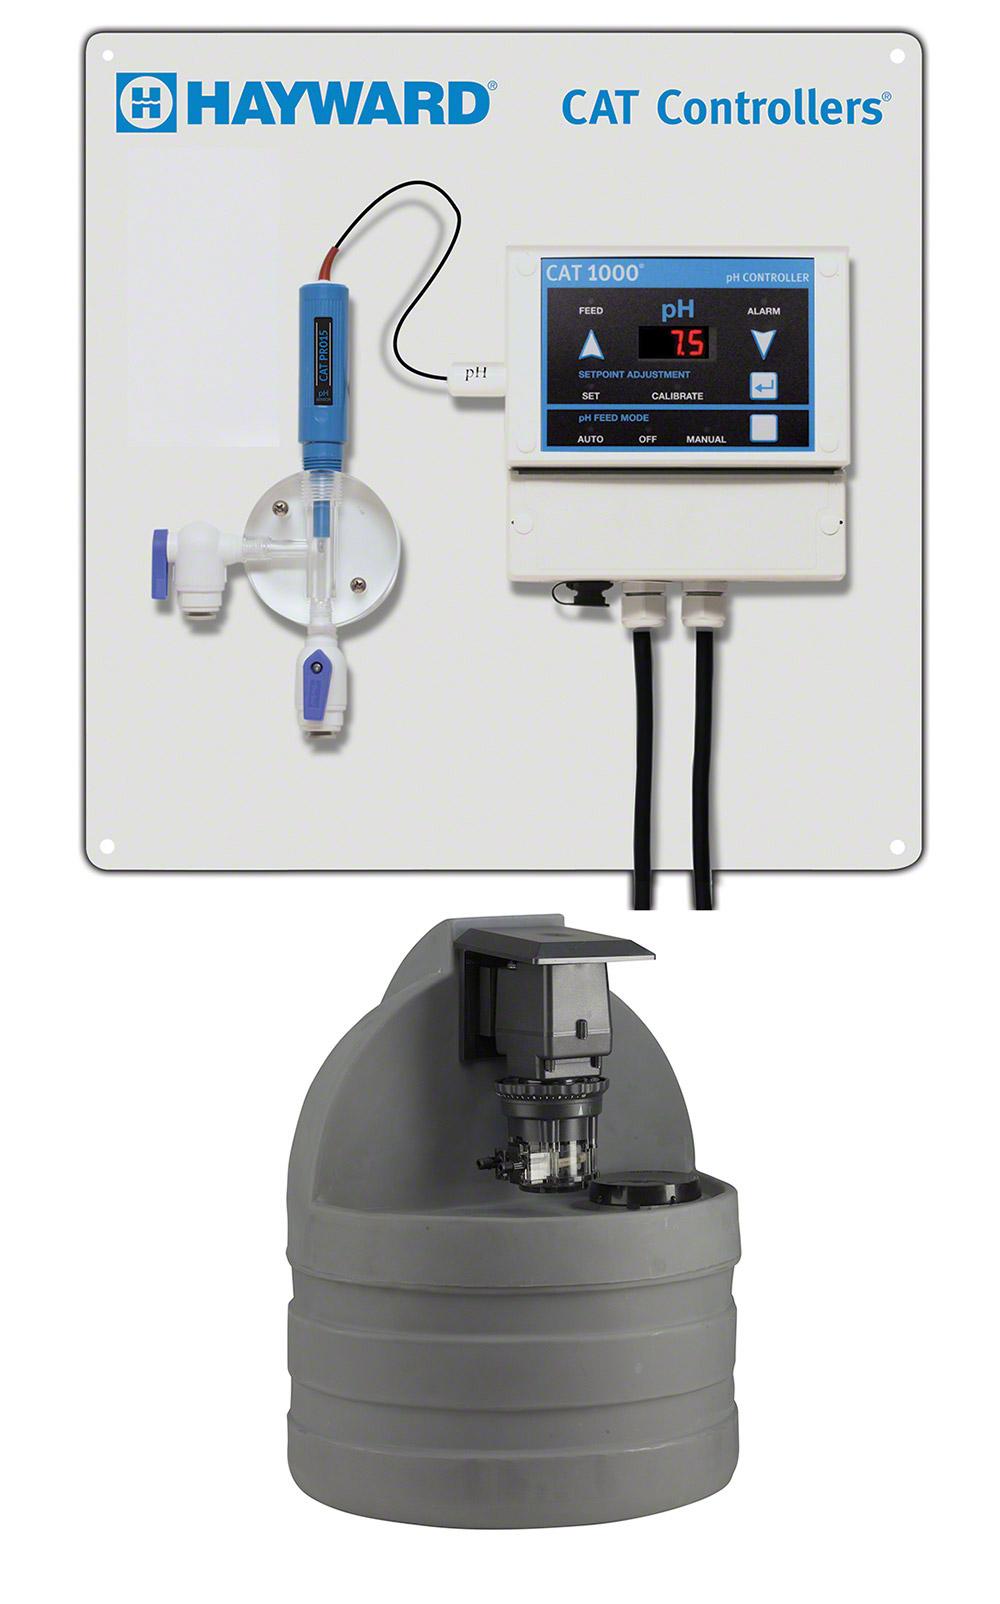 Hayward CAT 1000 pH controller w/ Pump and Tank Combo